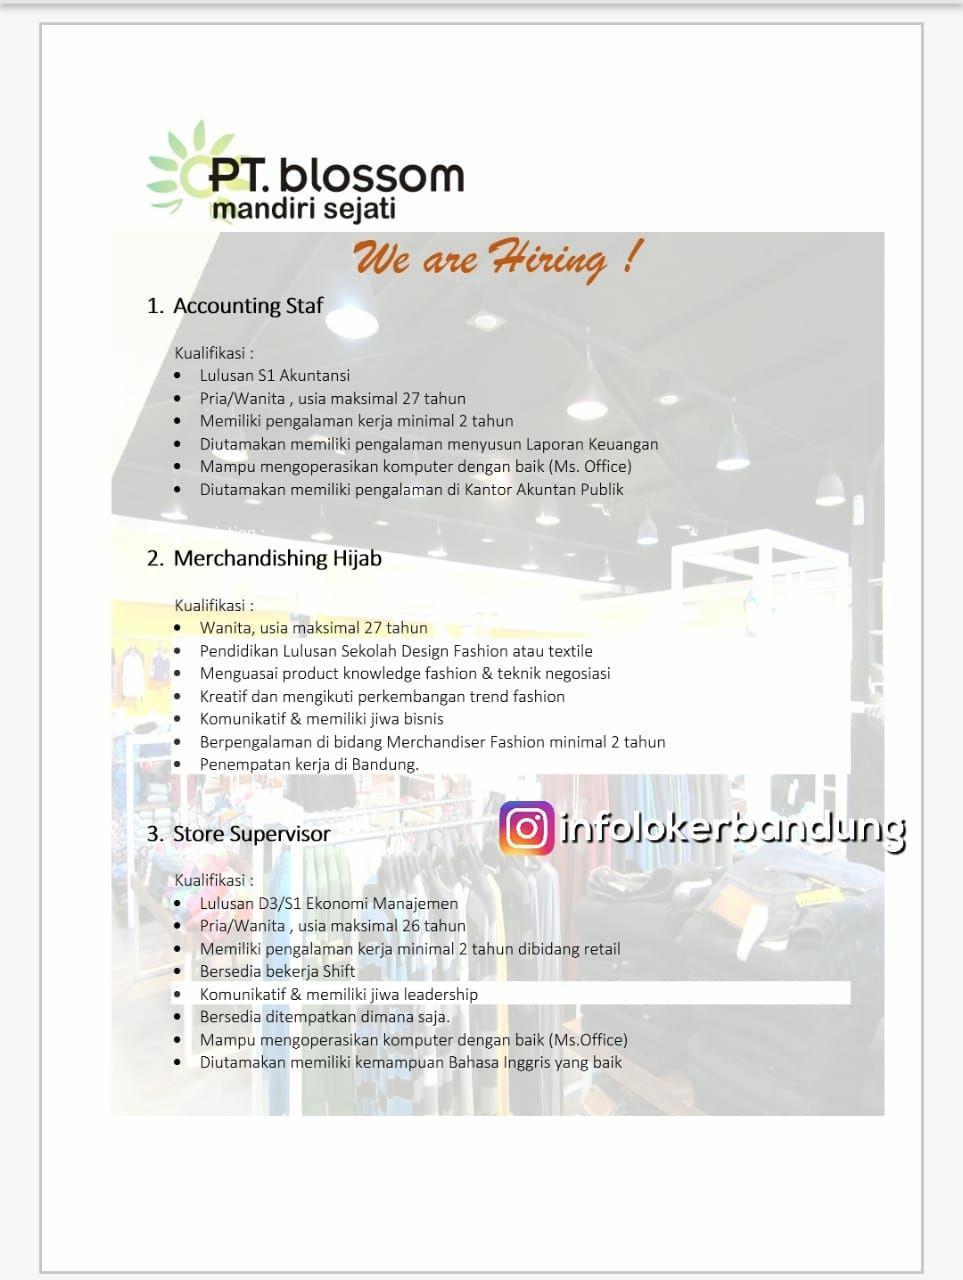 Lowongan Kerja PT. Blossom Mandiri Sejati Bandung Juli 2018